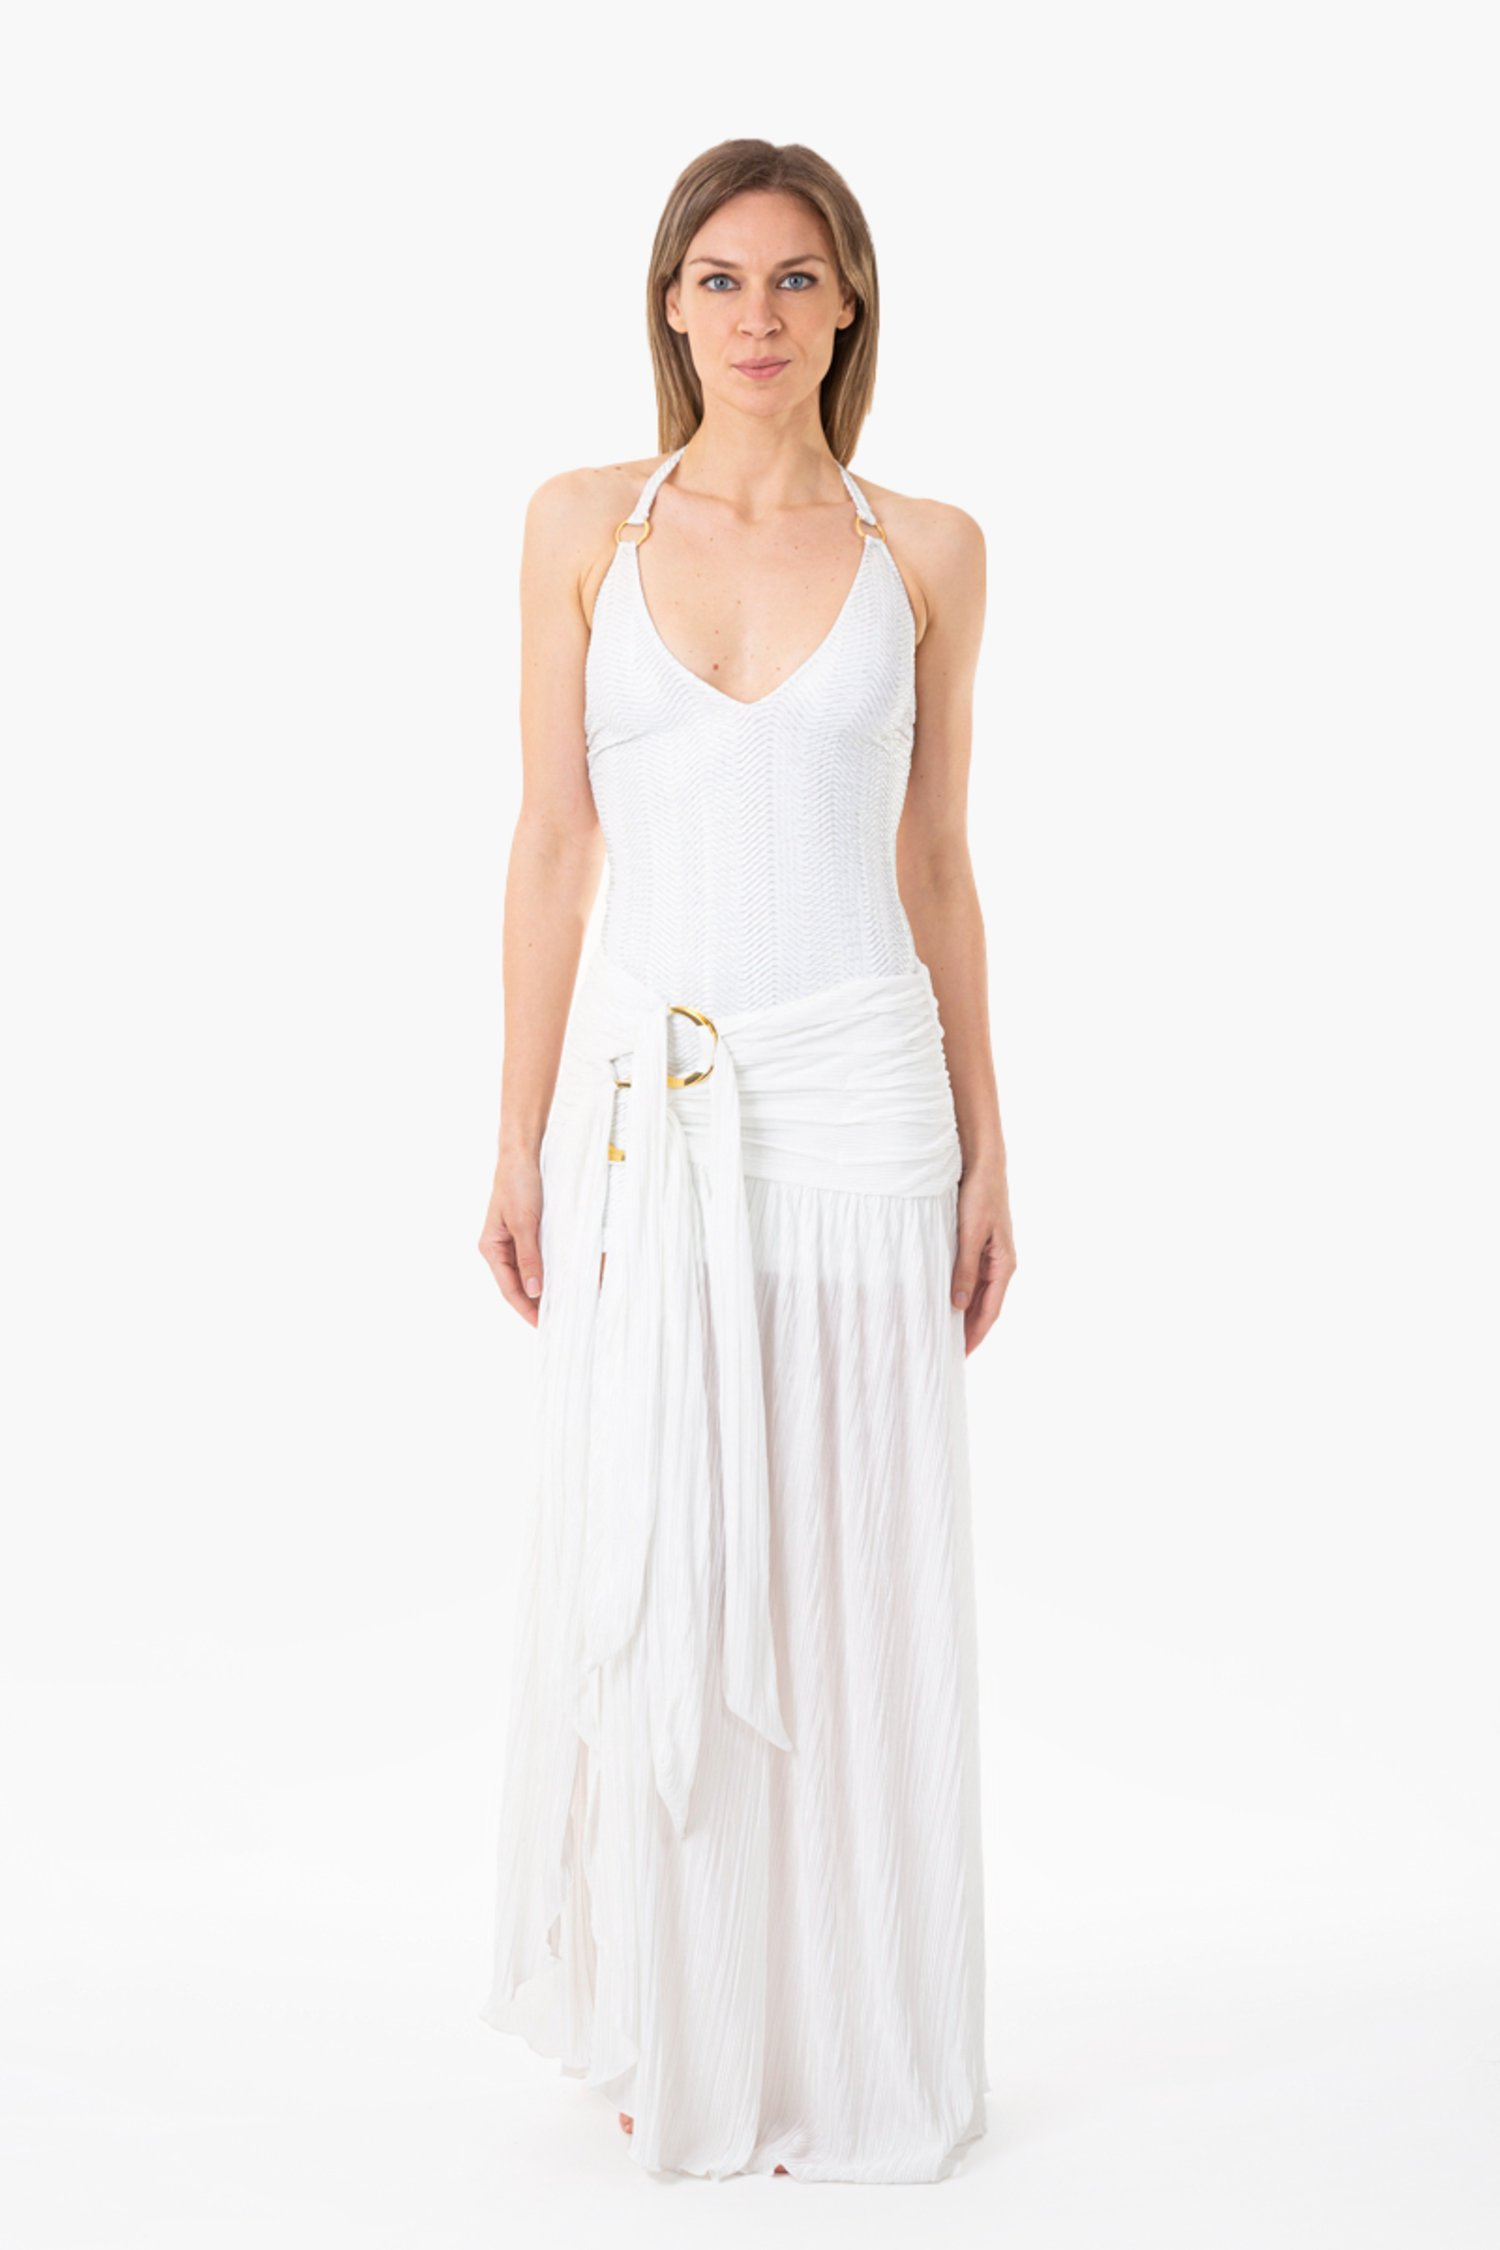 DRESS WITH RINGS, WIDE SKIRT AND RINGS - Microfibra Operata Splamata Bianco